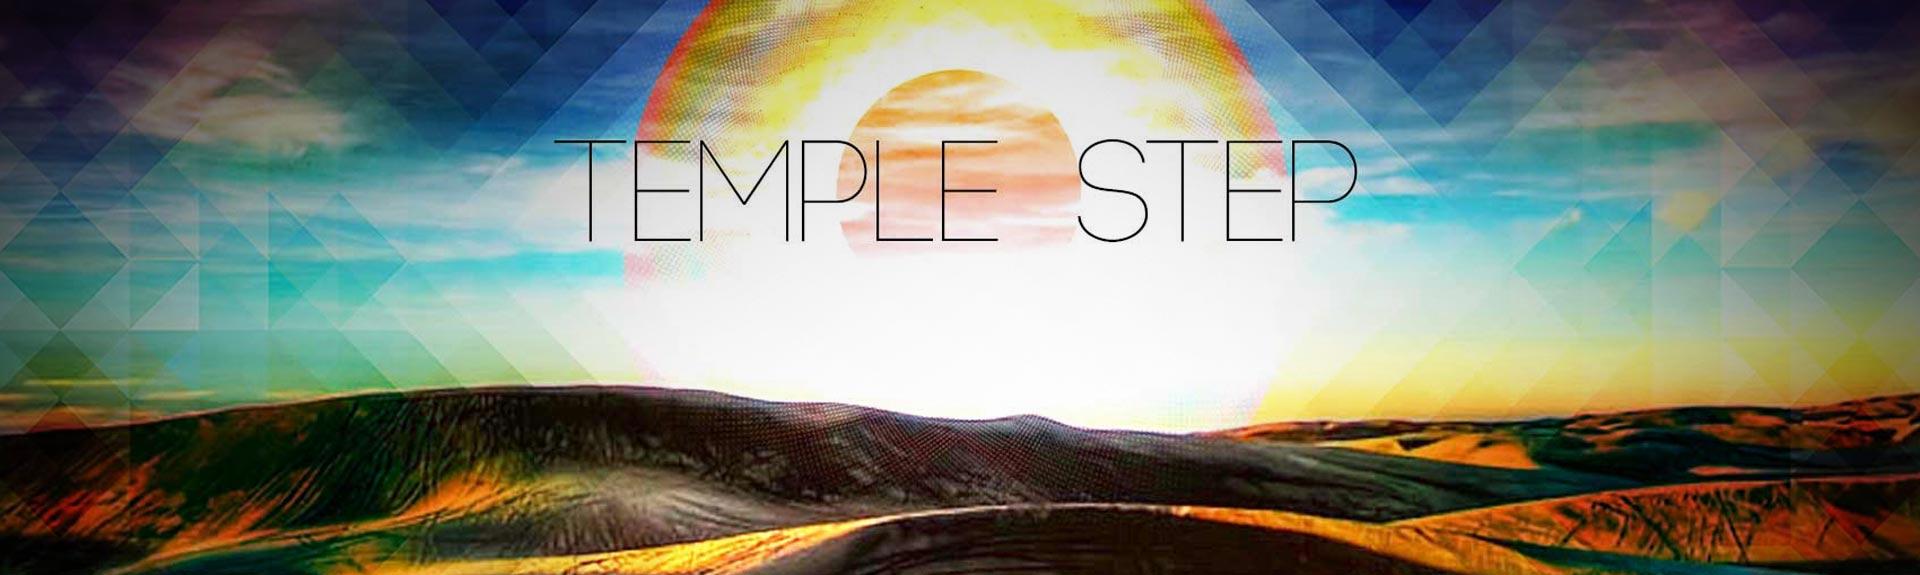 Temple-Step